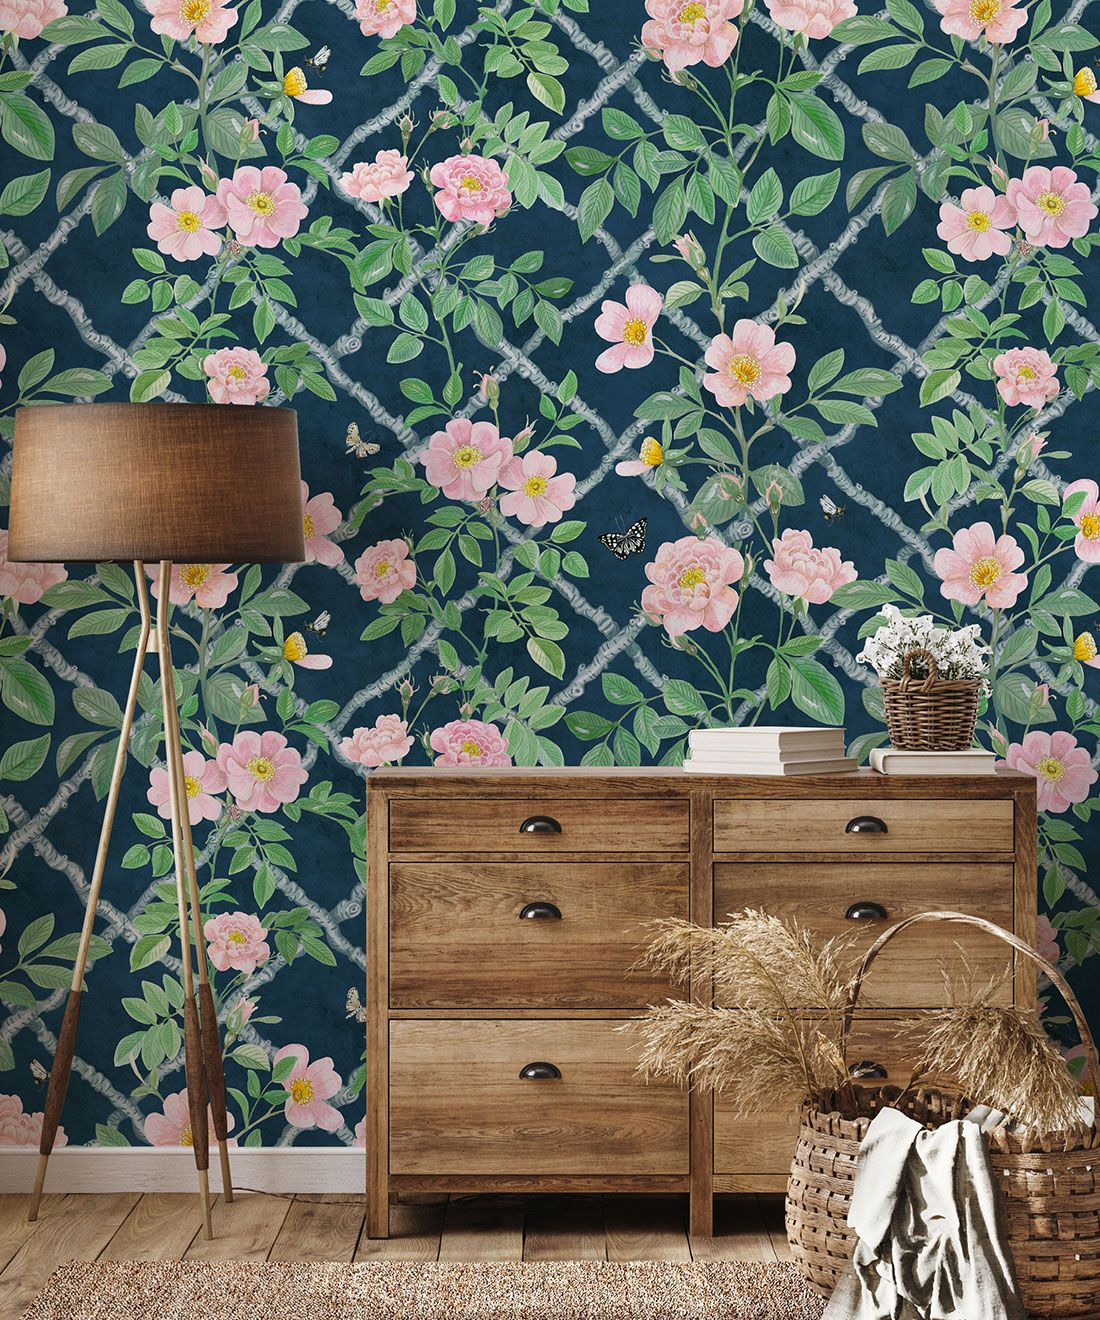 Treilage Wallpaper • Floral Wallpaper • Rose • Insitu